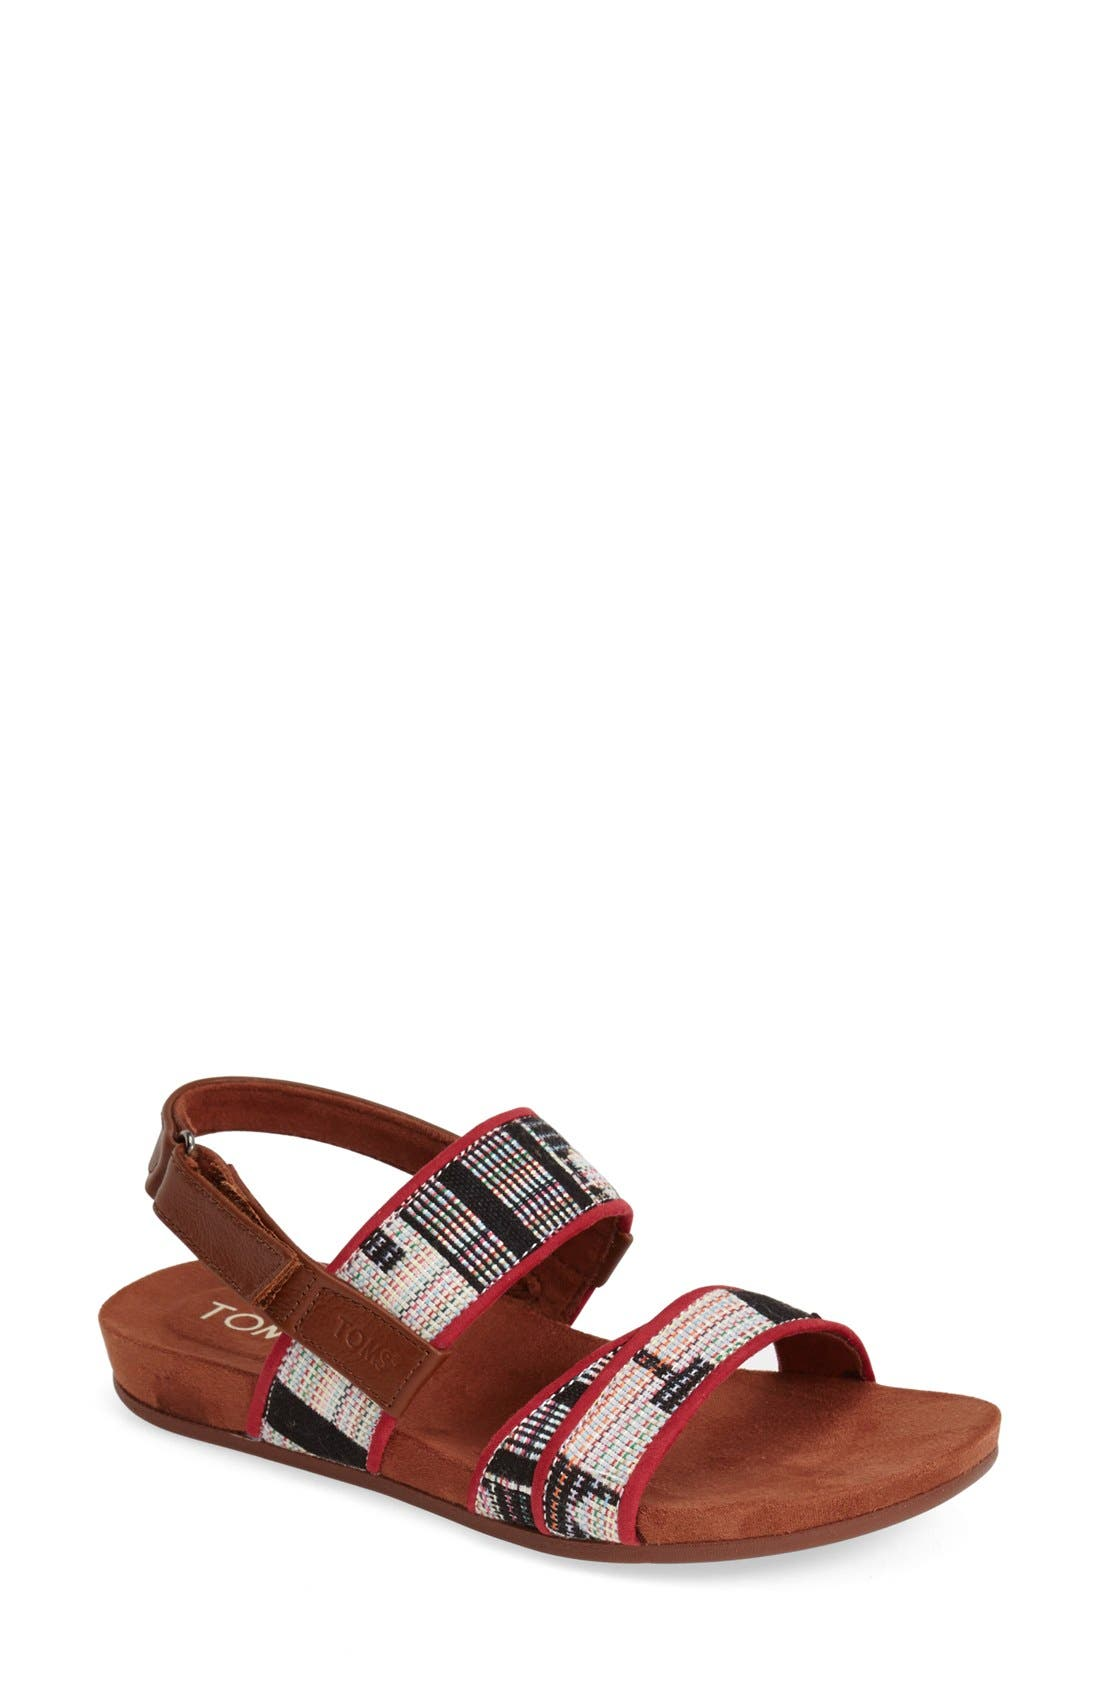 Alternate Image 1 Selected - TOMS 'Tierra' Woven Sandal (Women)